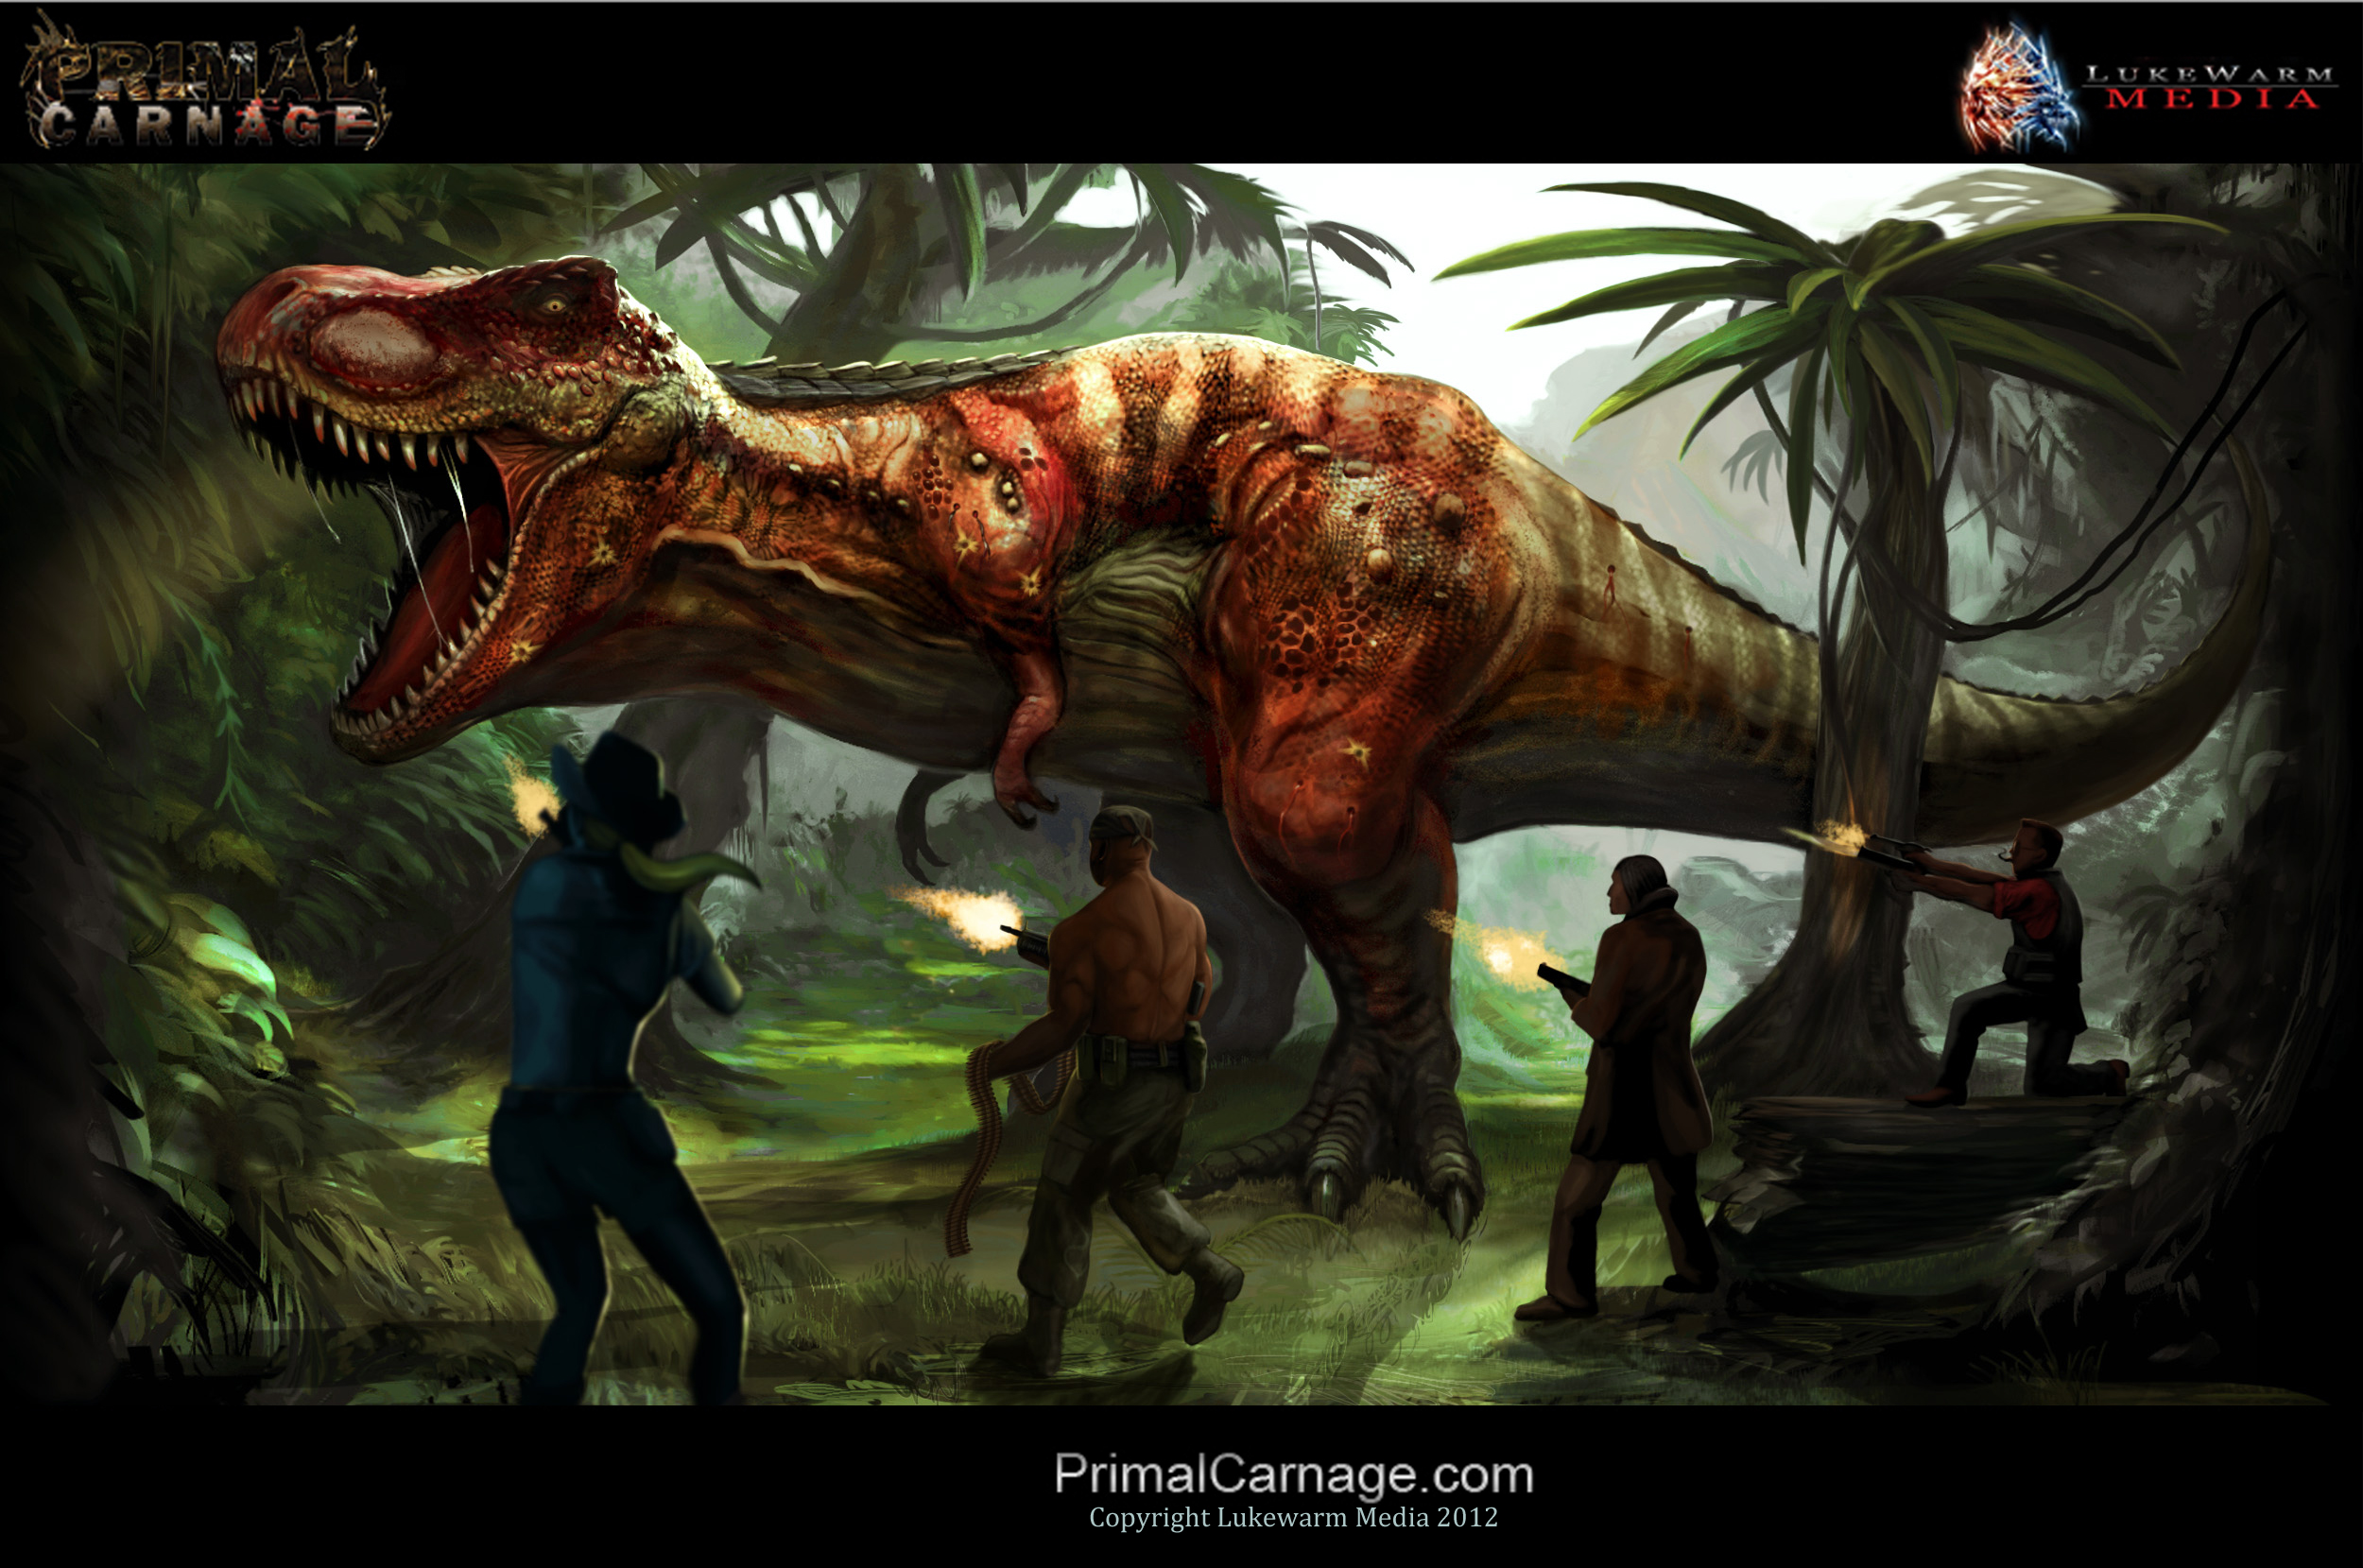 PRIMAL CARNAGE fantasy dinosaur h wallpaper 2500x1659 169030 2500x1659